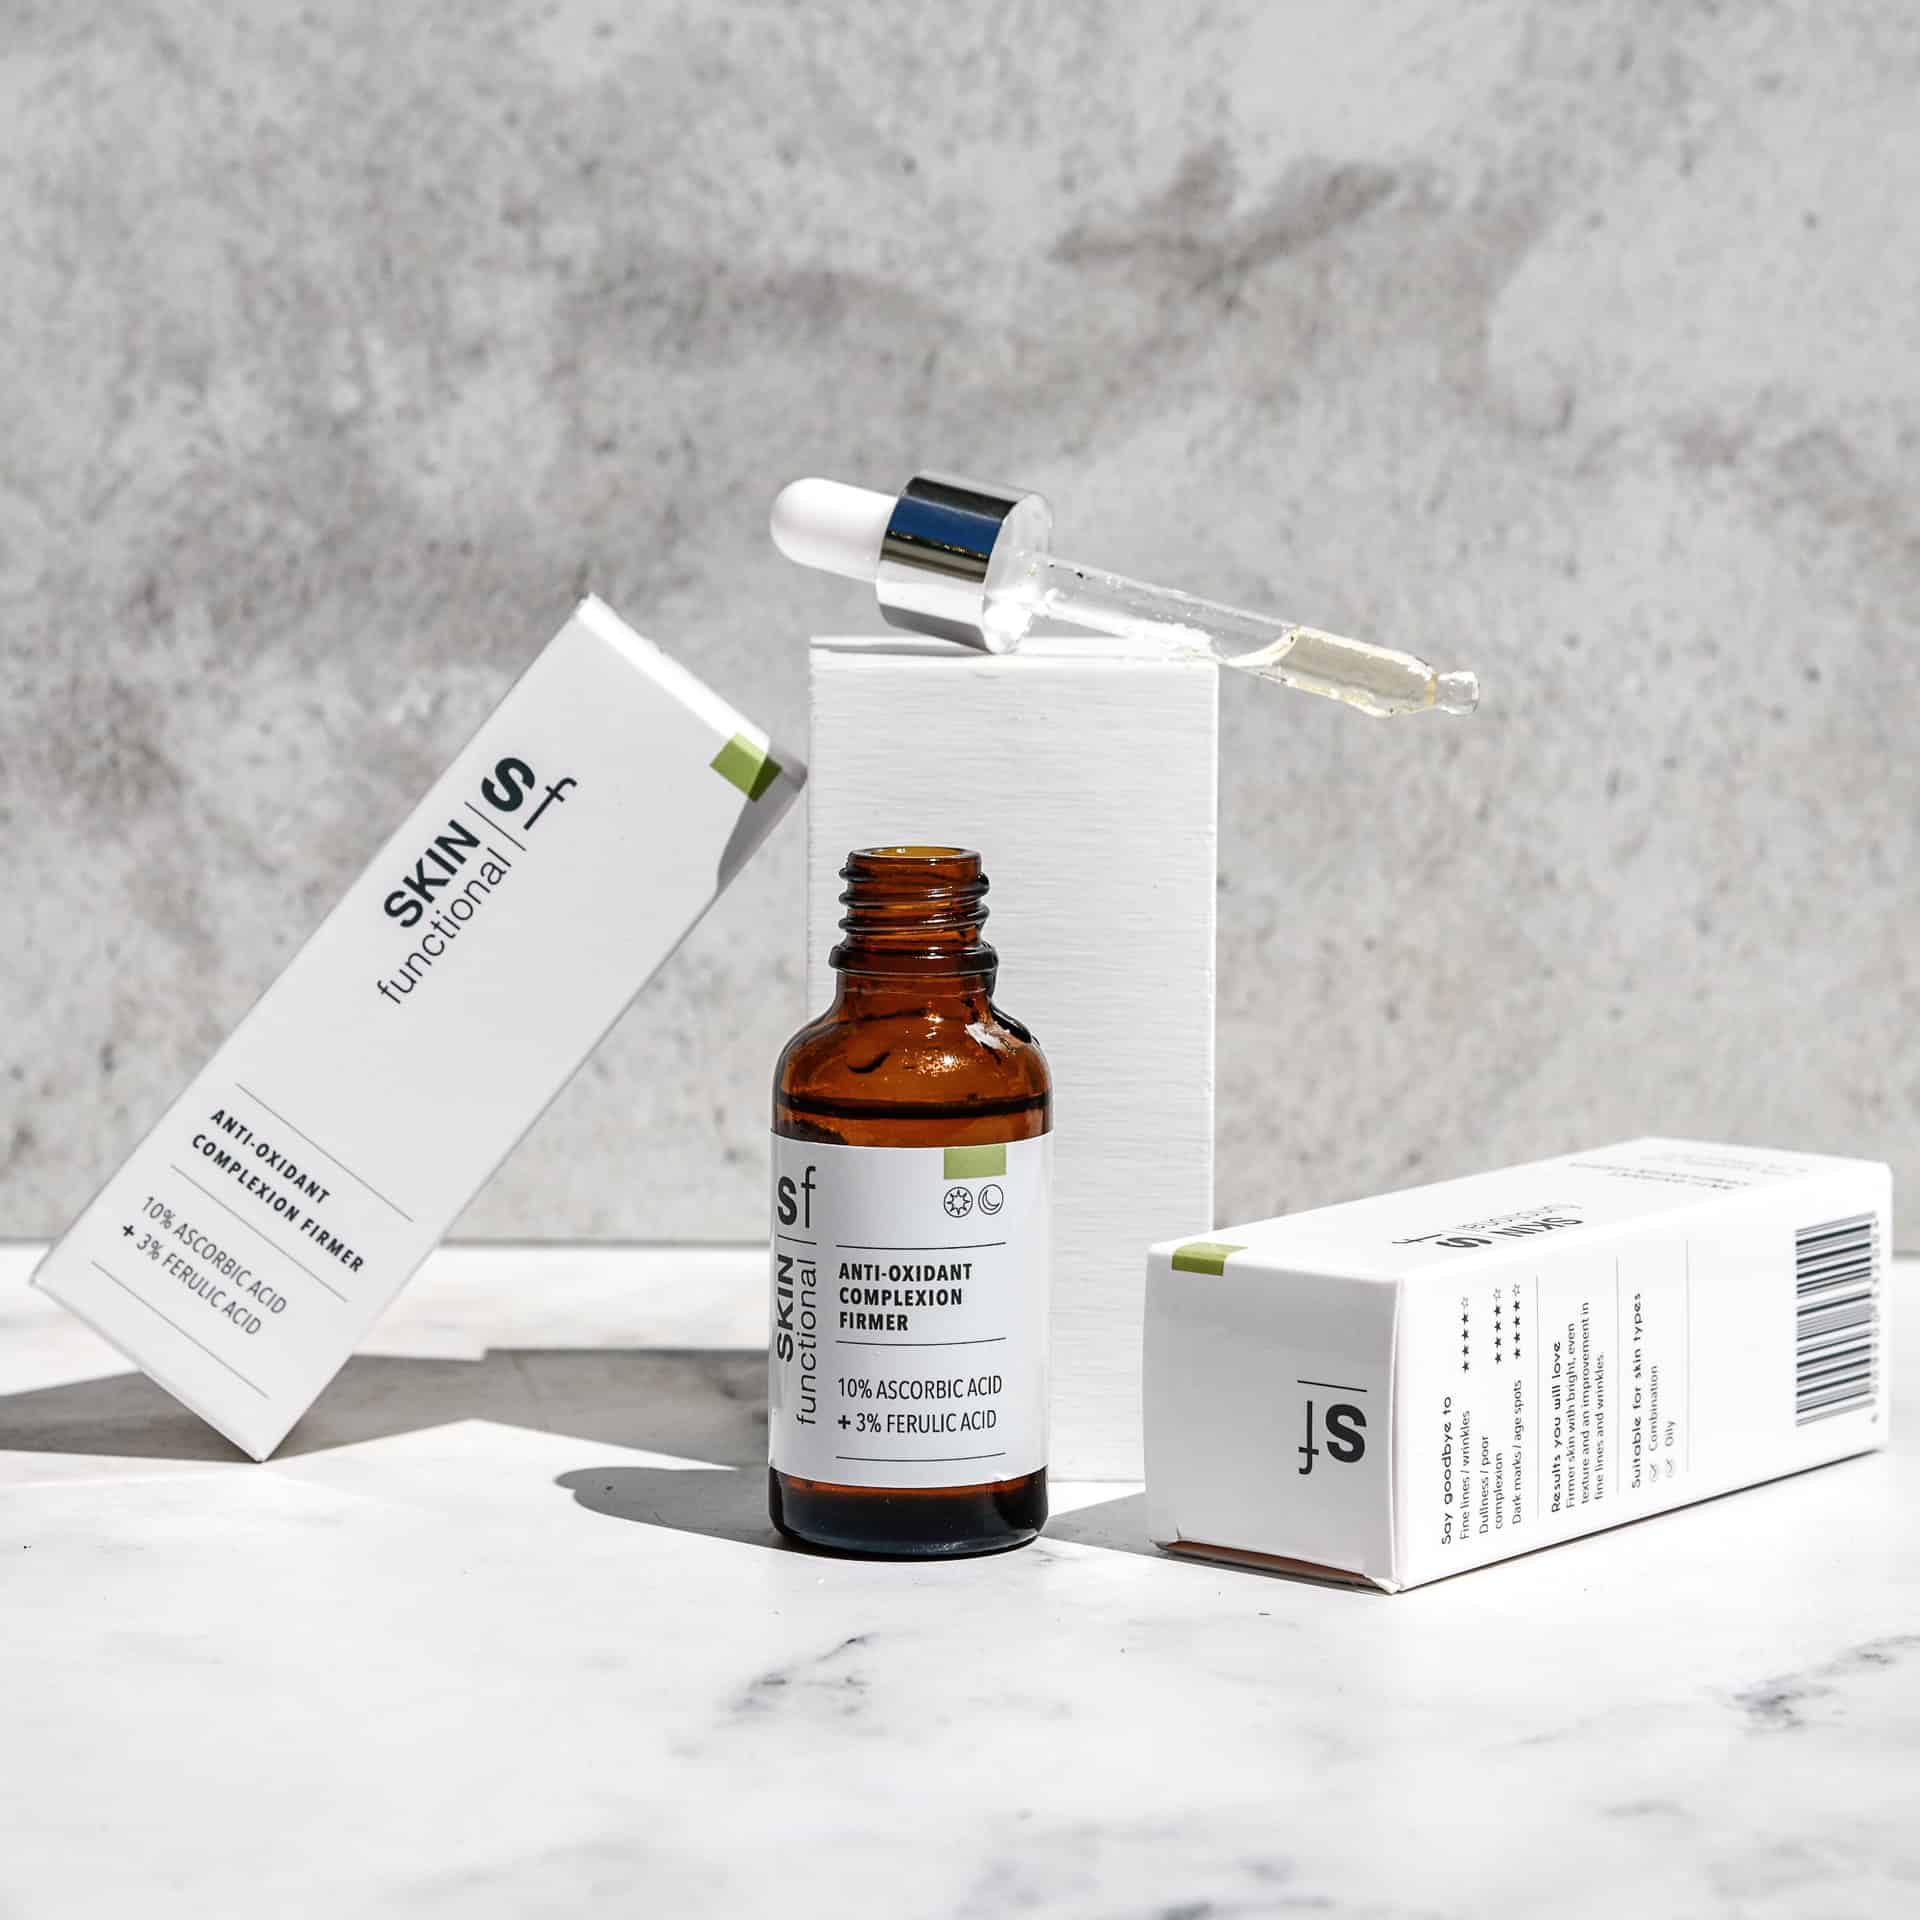 Anti-Oxidant Complexion - 10% Ascorbic Acid + 3% Ferulic Acid